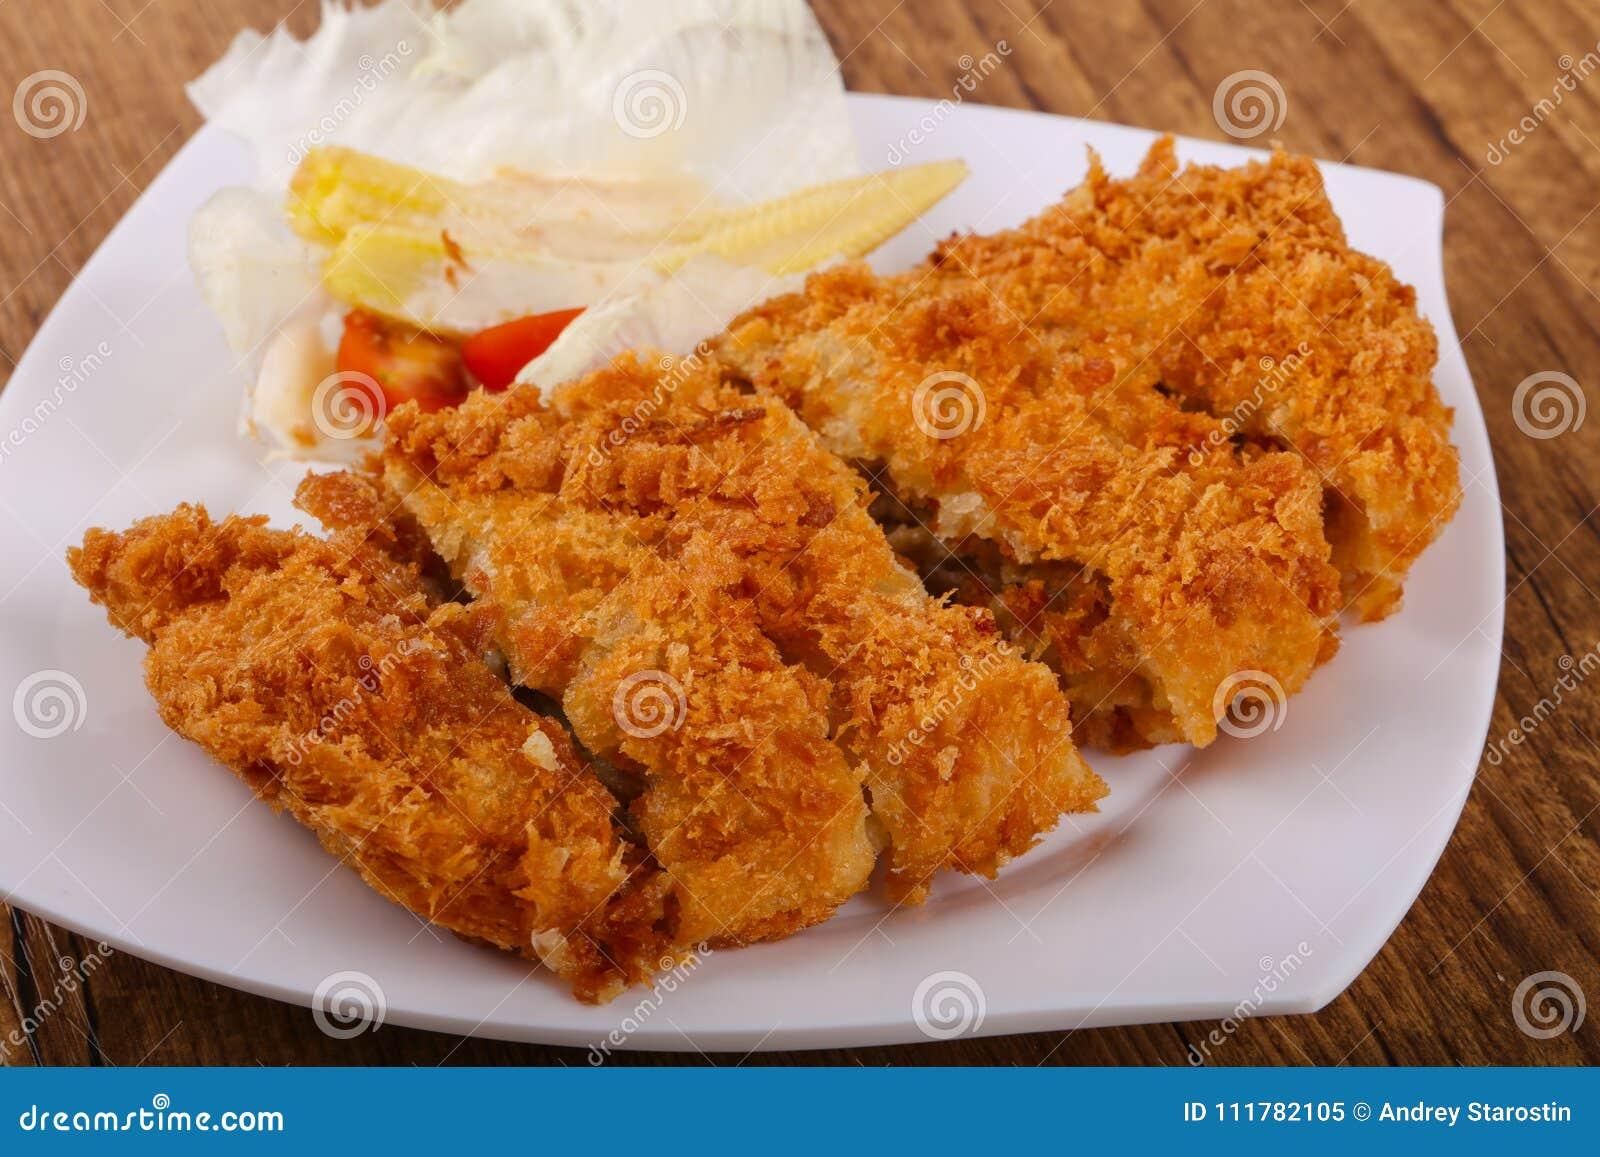 Crispy Pork with cheese